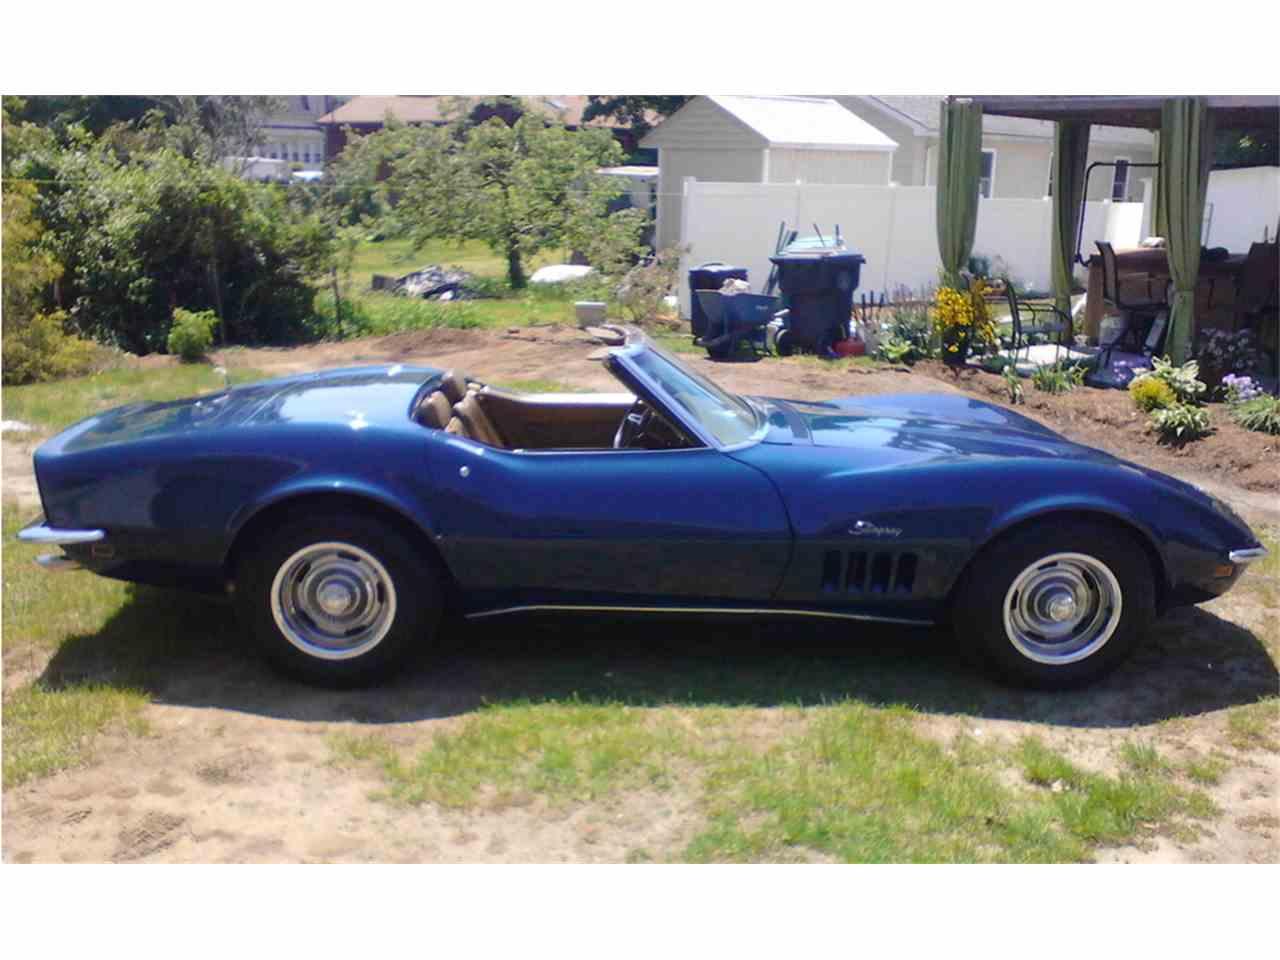 Cars For Sale In Ri: 1969 Chevrolet Corvette For Sale